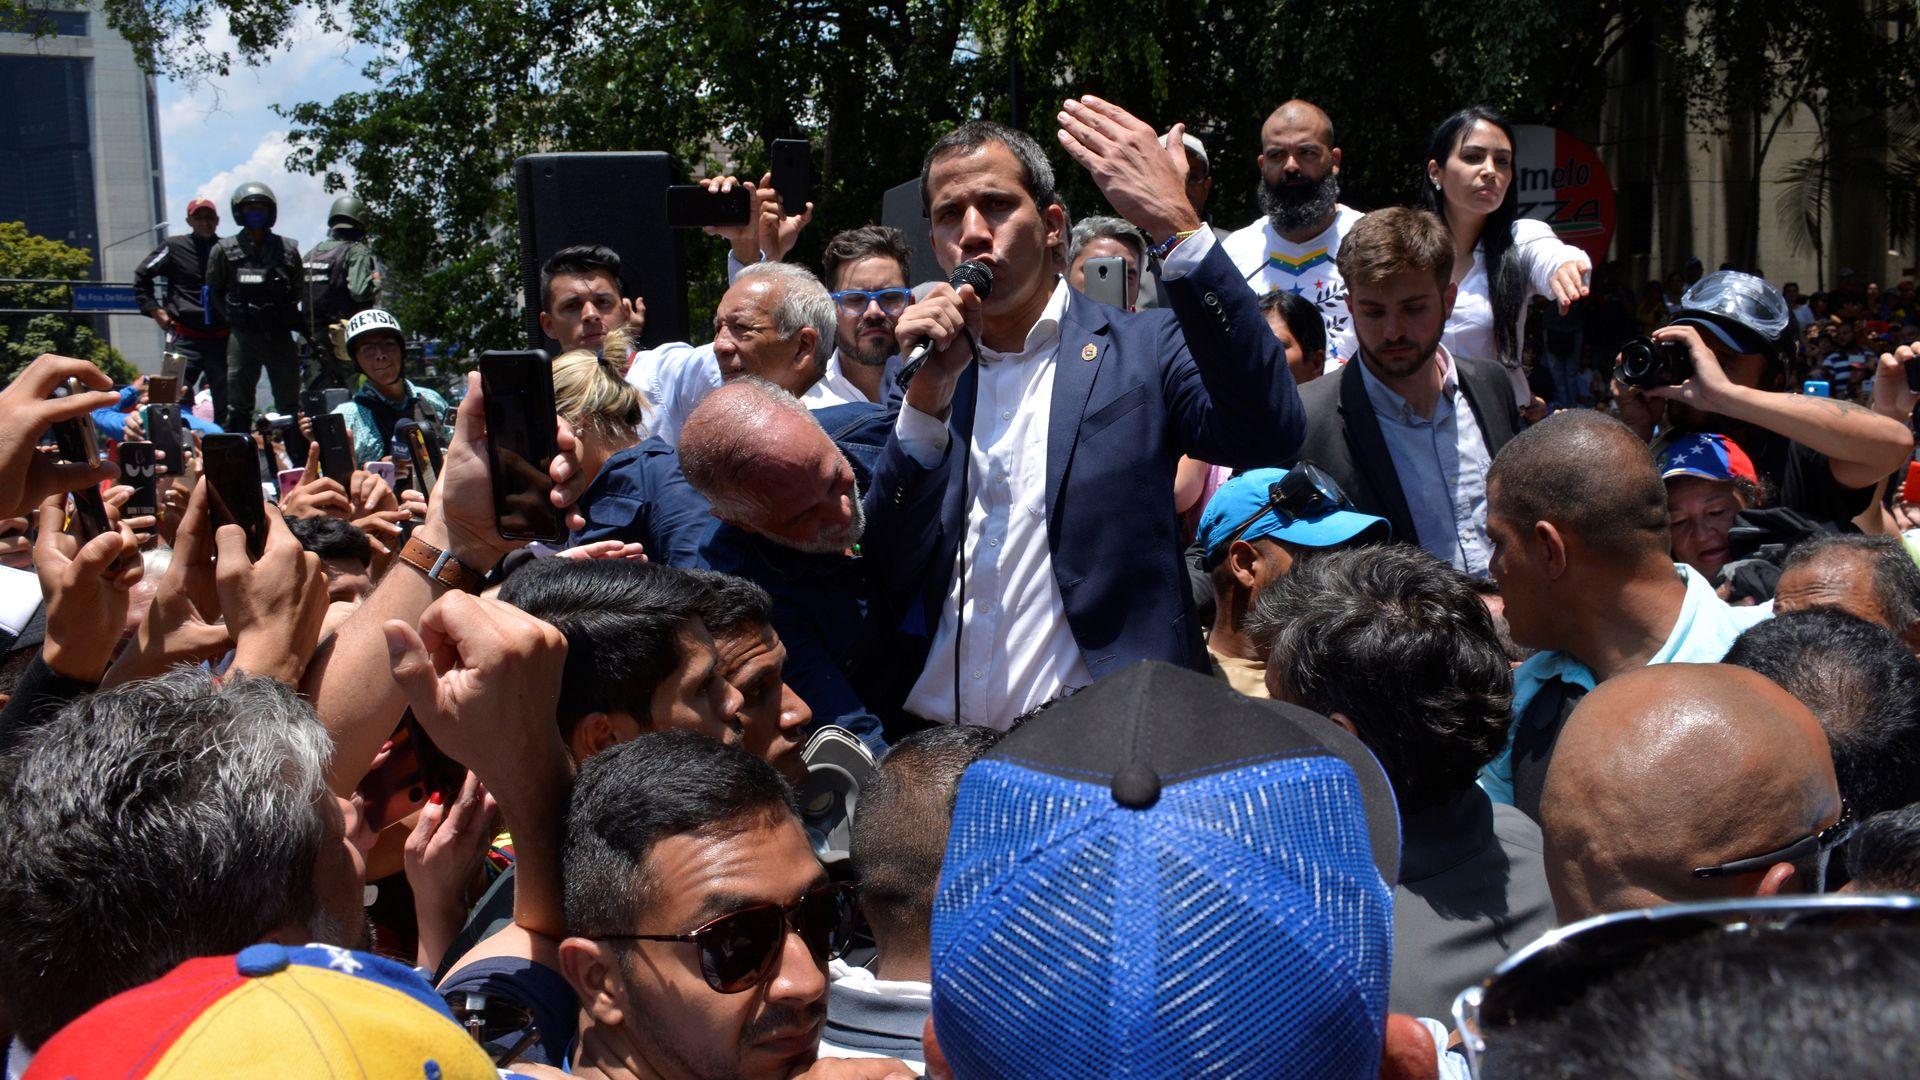 Opposition's gambit stalls after day of tumult rocks Venezuela